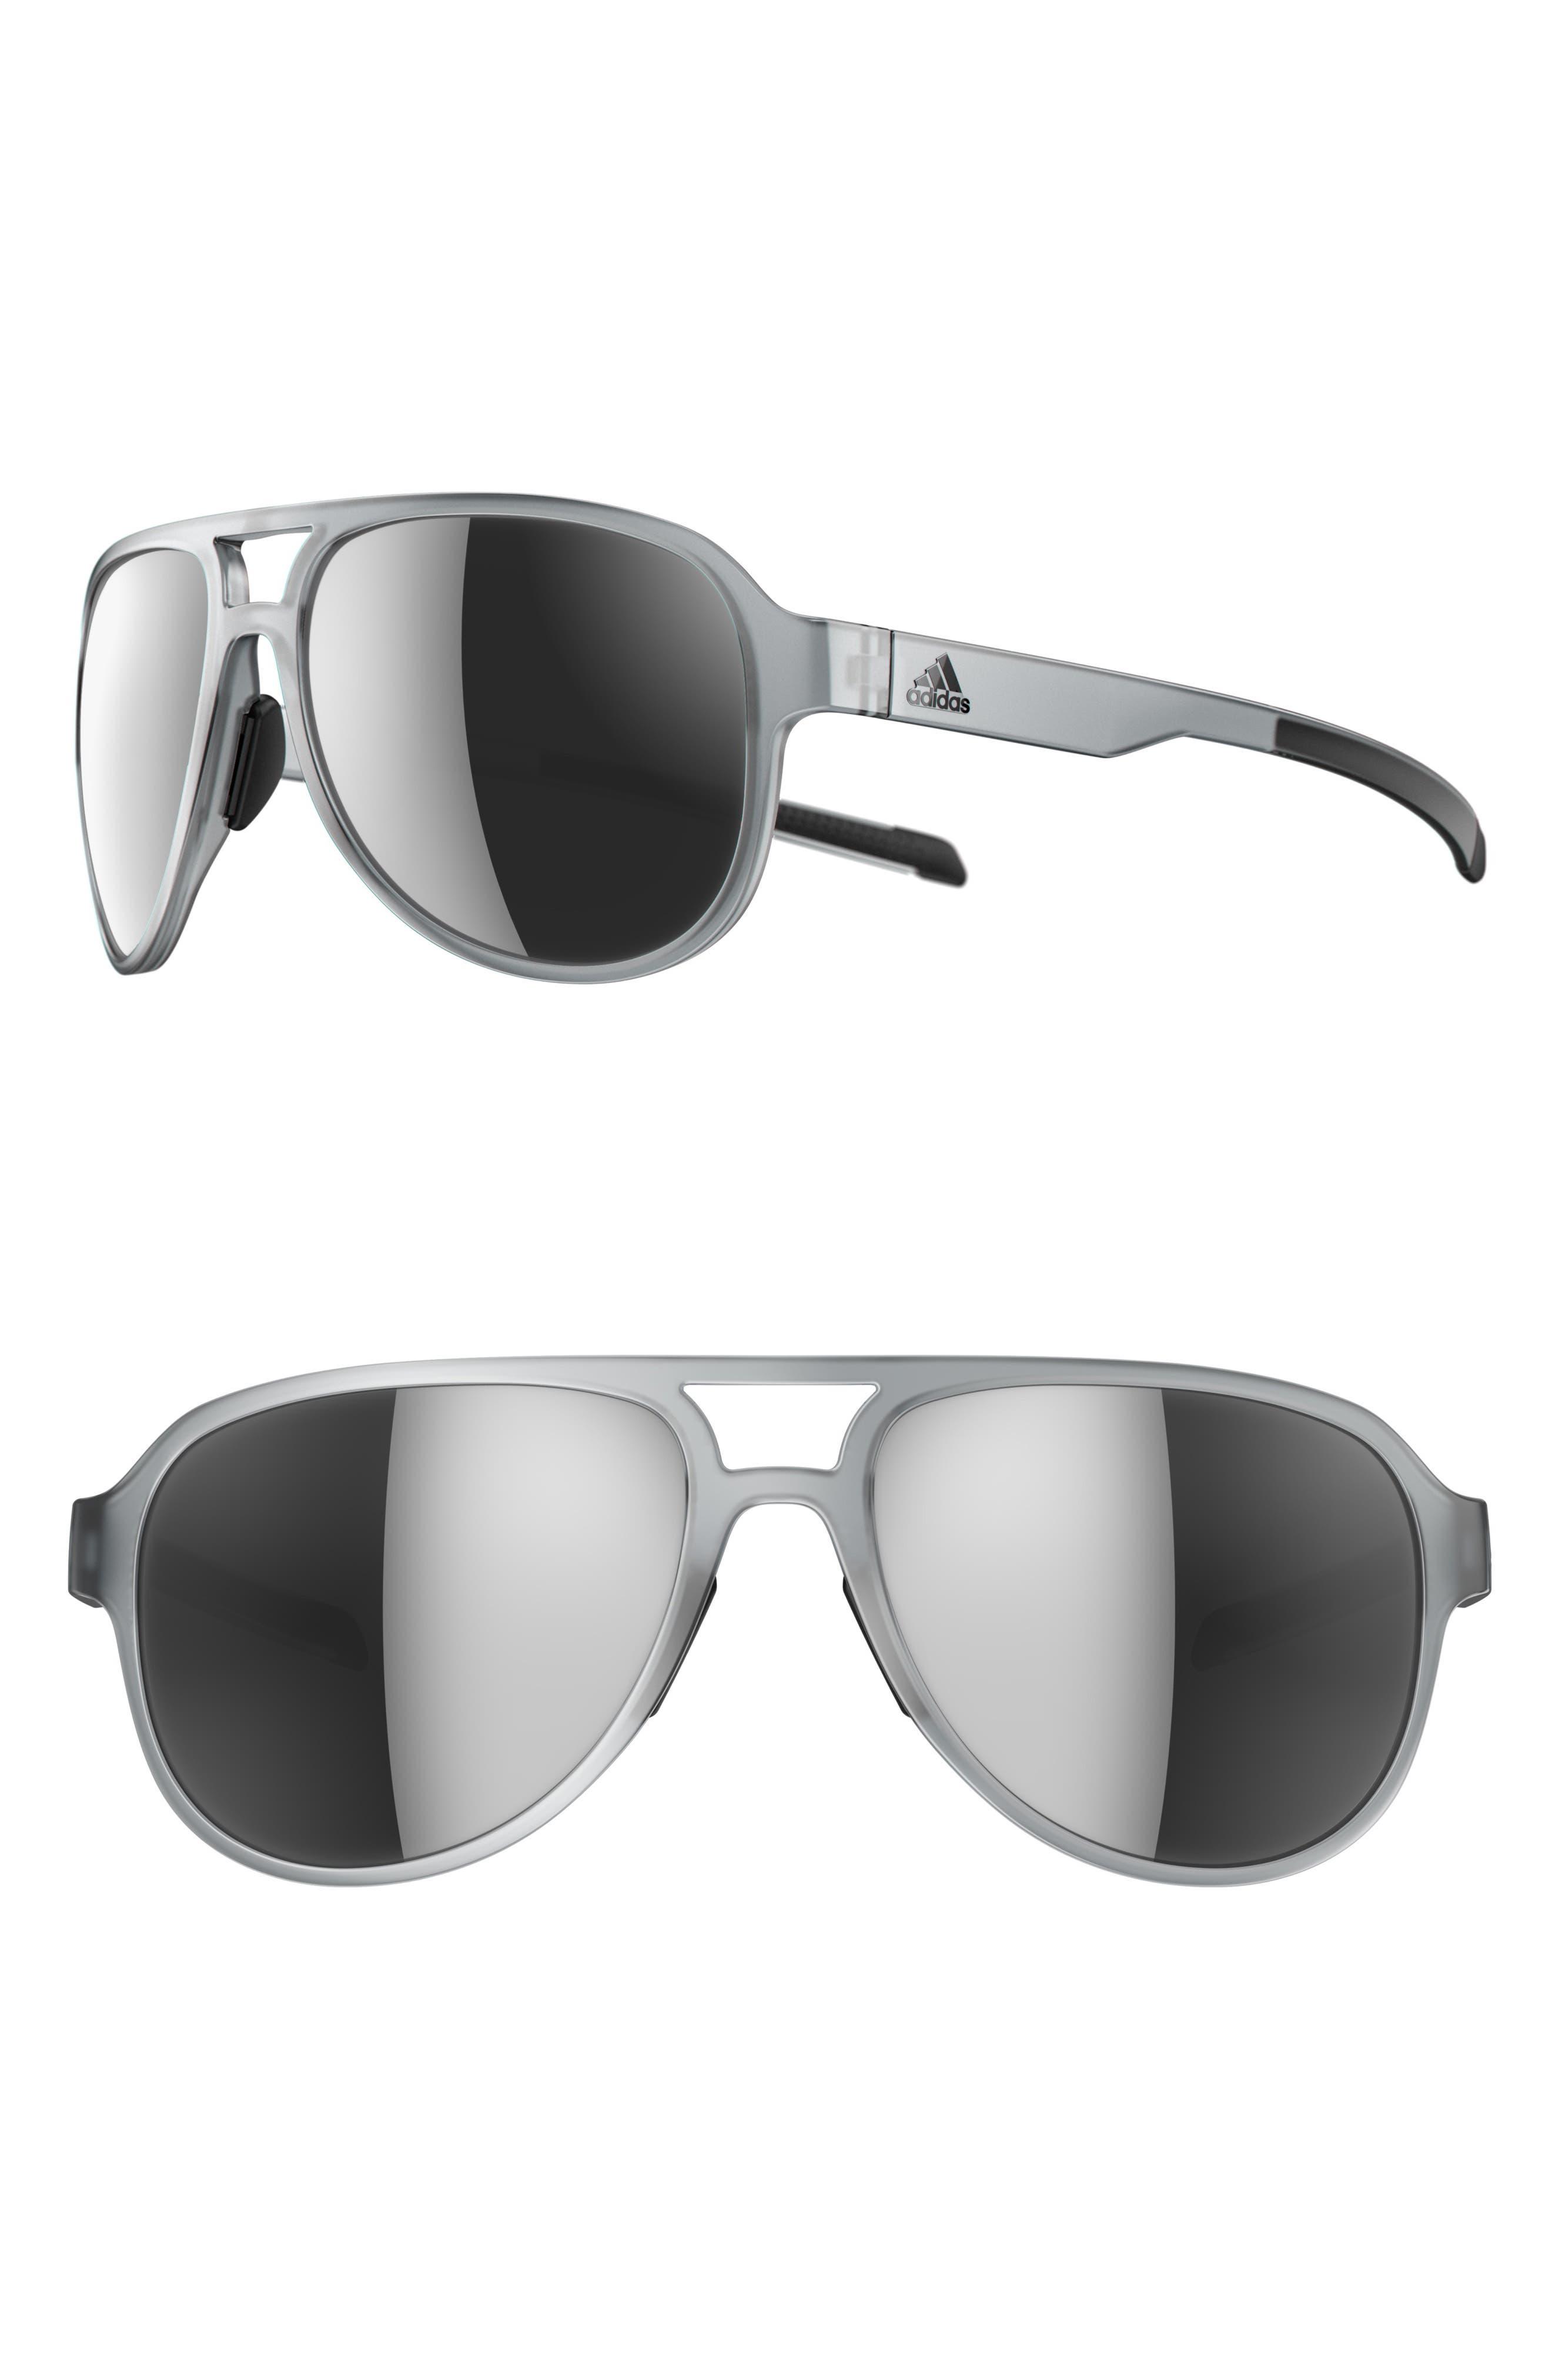 Pacyr 58mm Mirrored Sunglasses,                         Main,                         color, CRYSTAL GREY/ CHROME